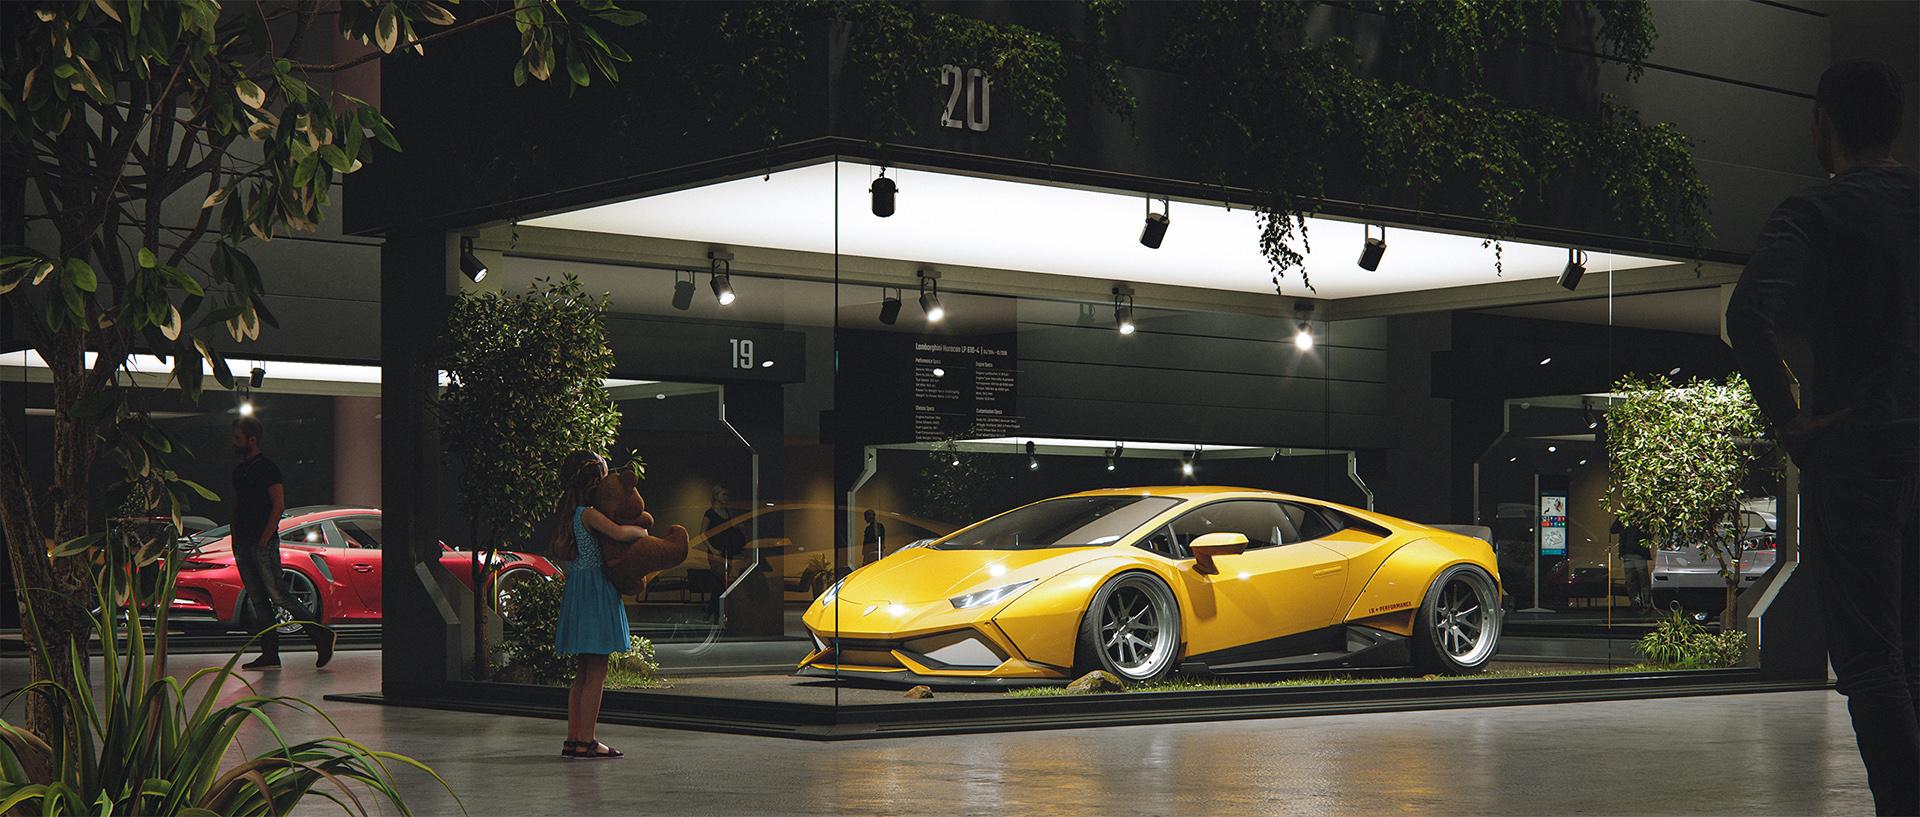 Car Render Challenge 2020 - No title yet